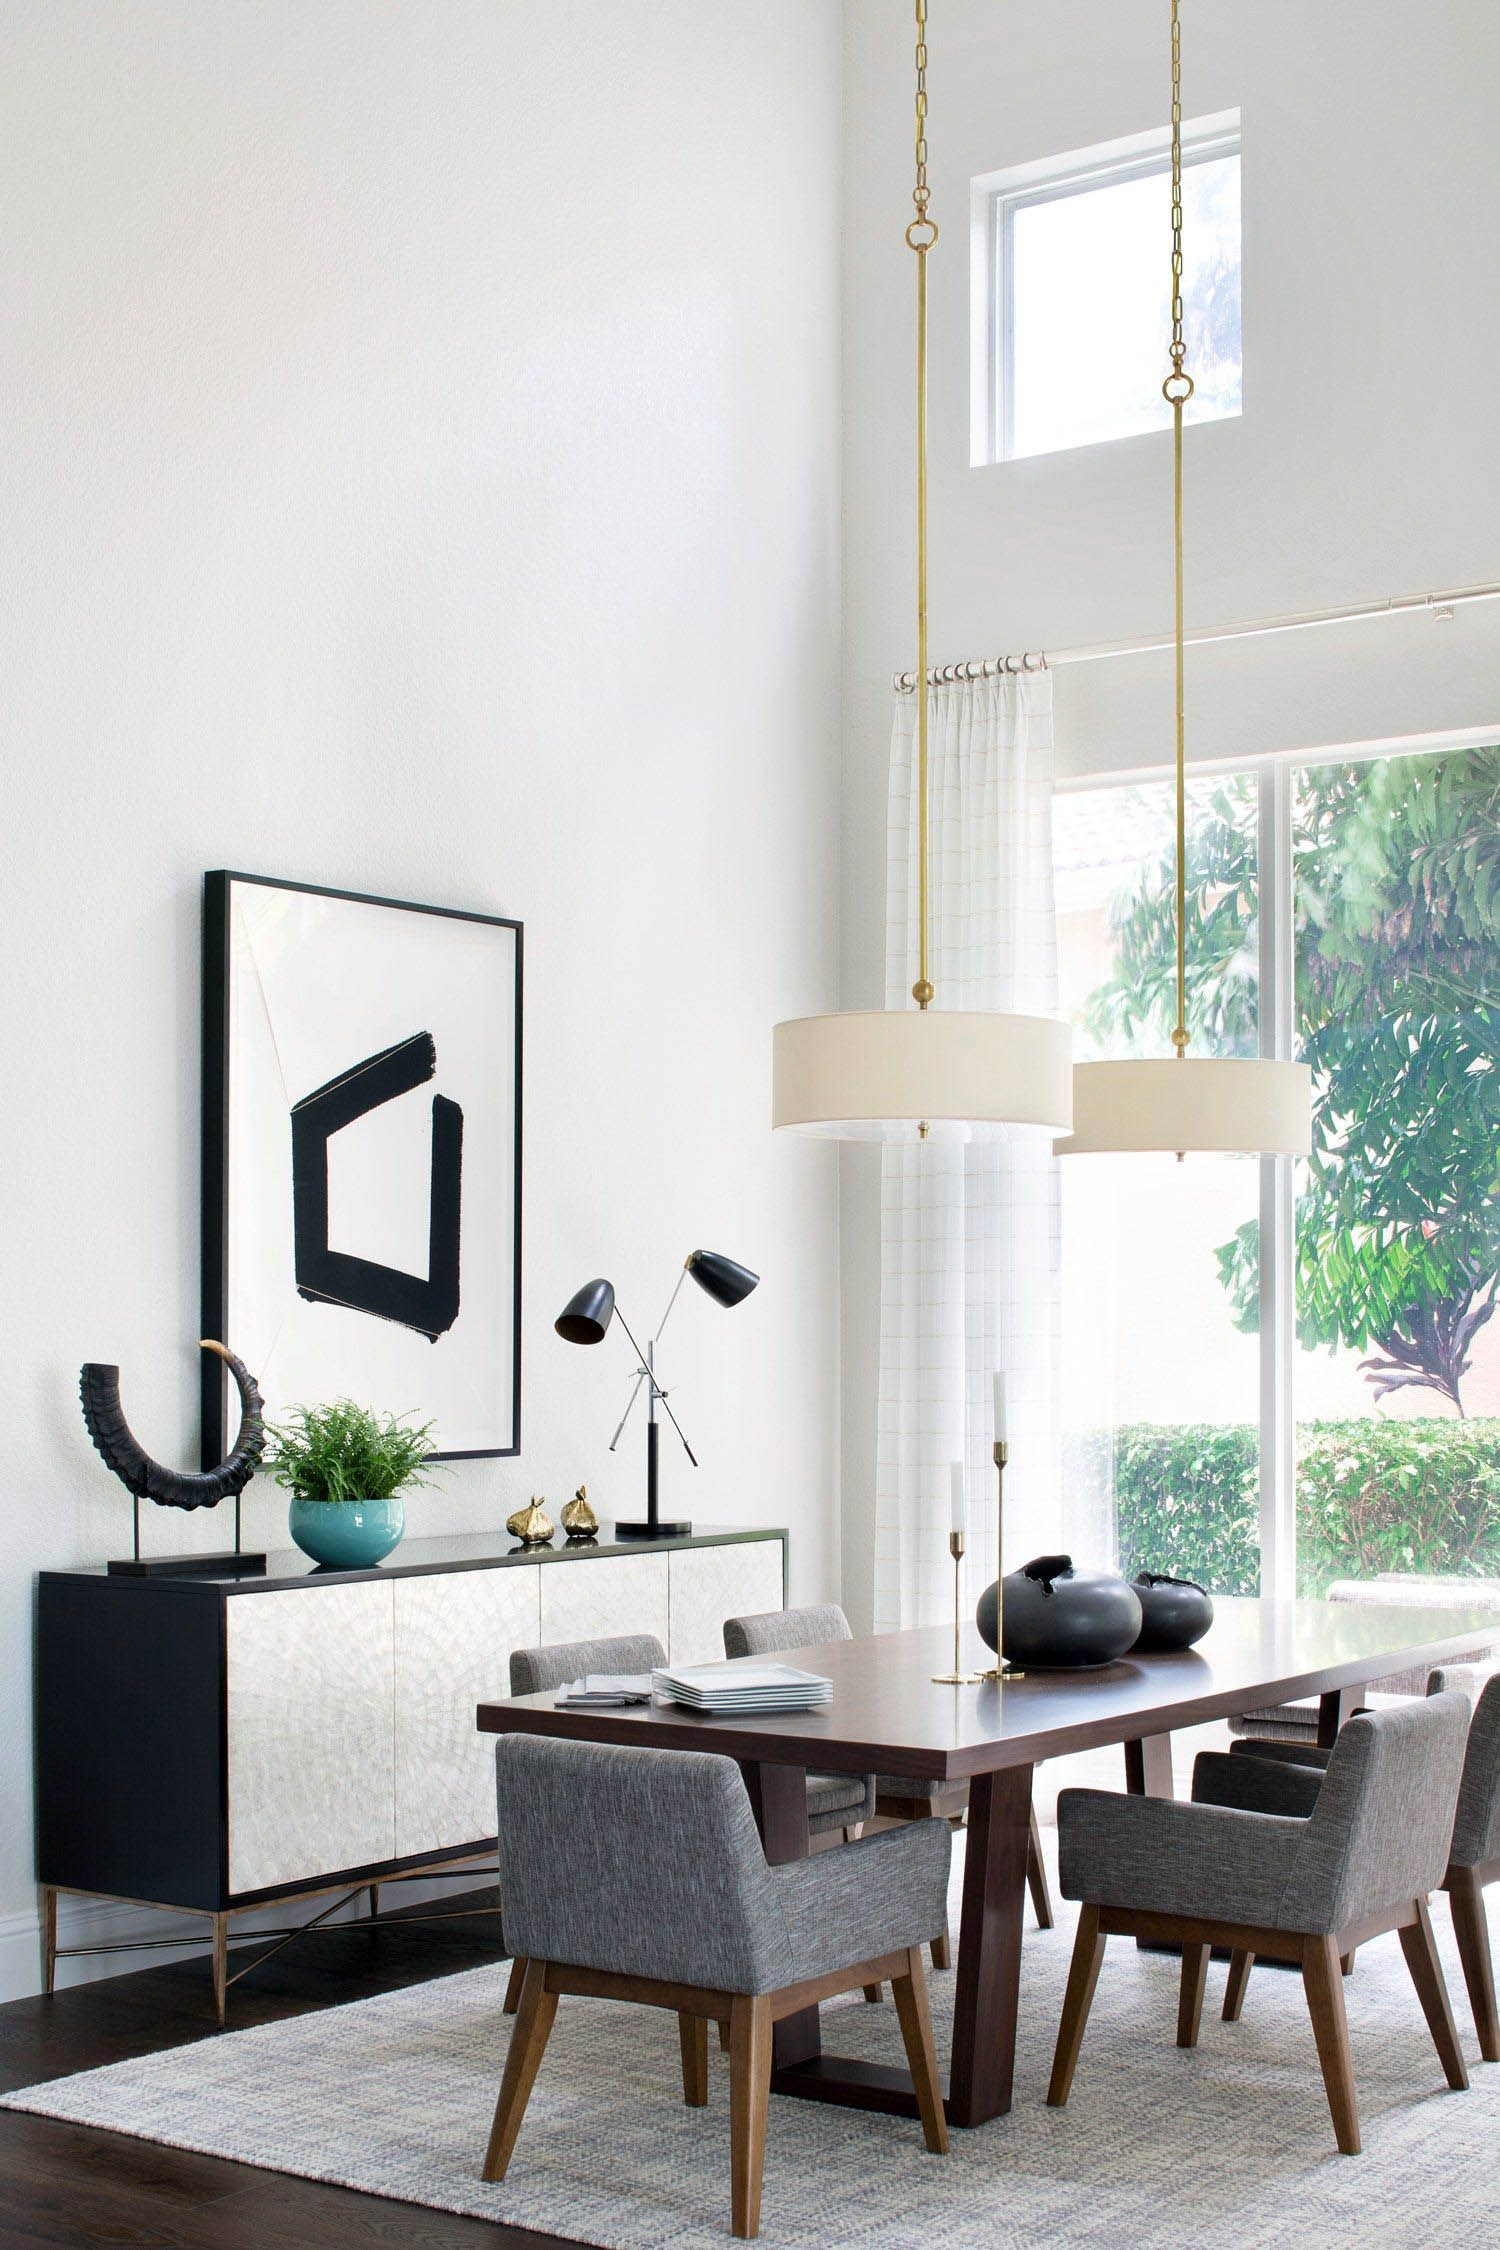 Dining Room Set Under 300 - Home Interior Gallery